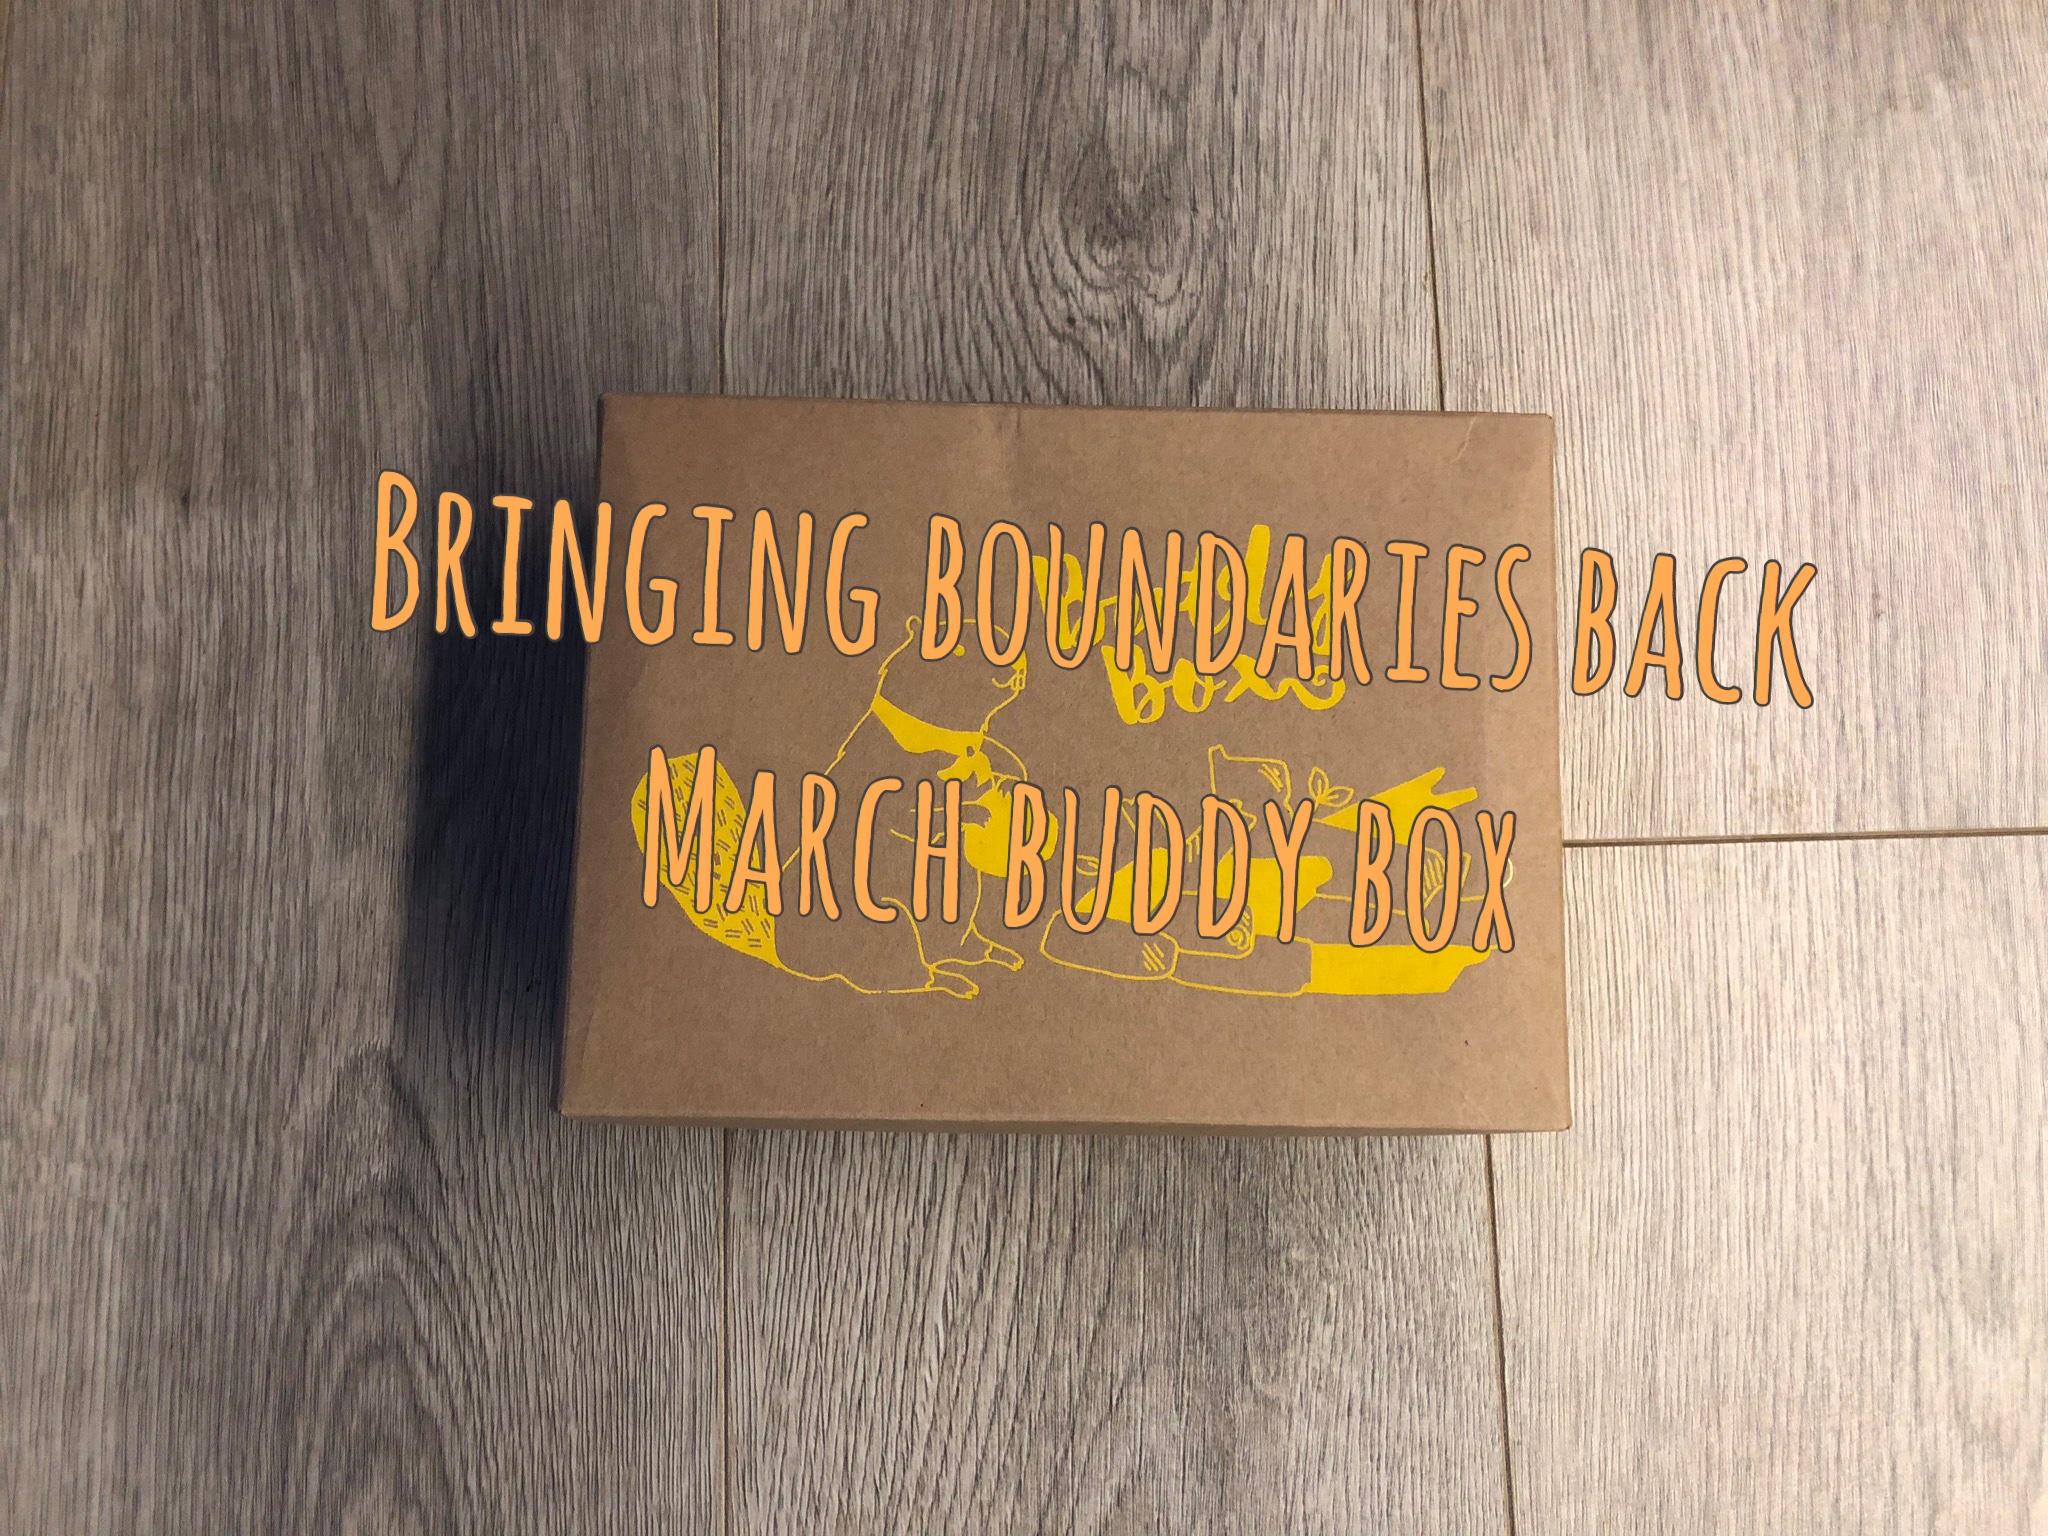 Bringing  Boundaries Back Buddy Box graphic